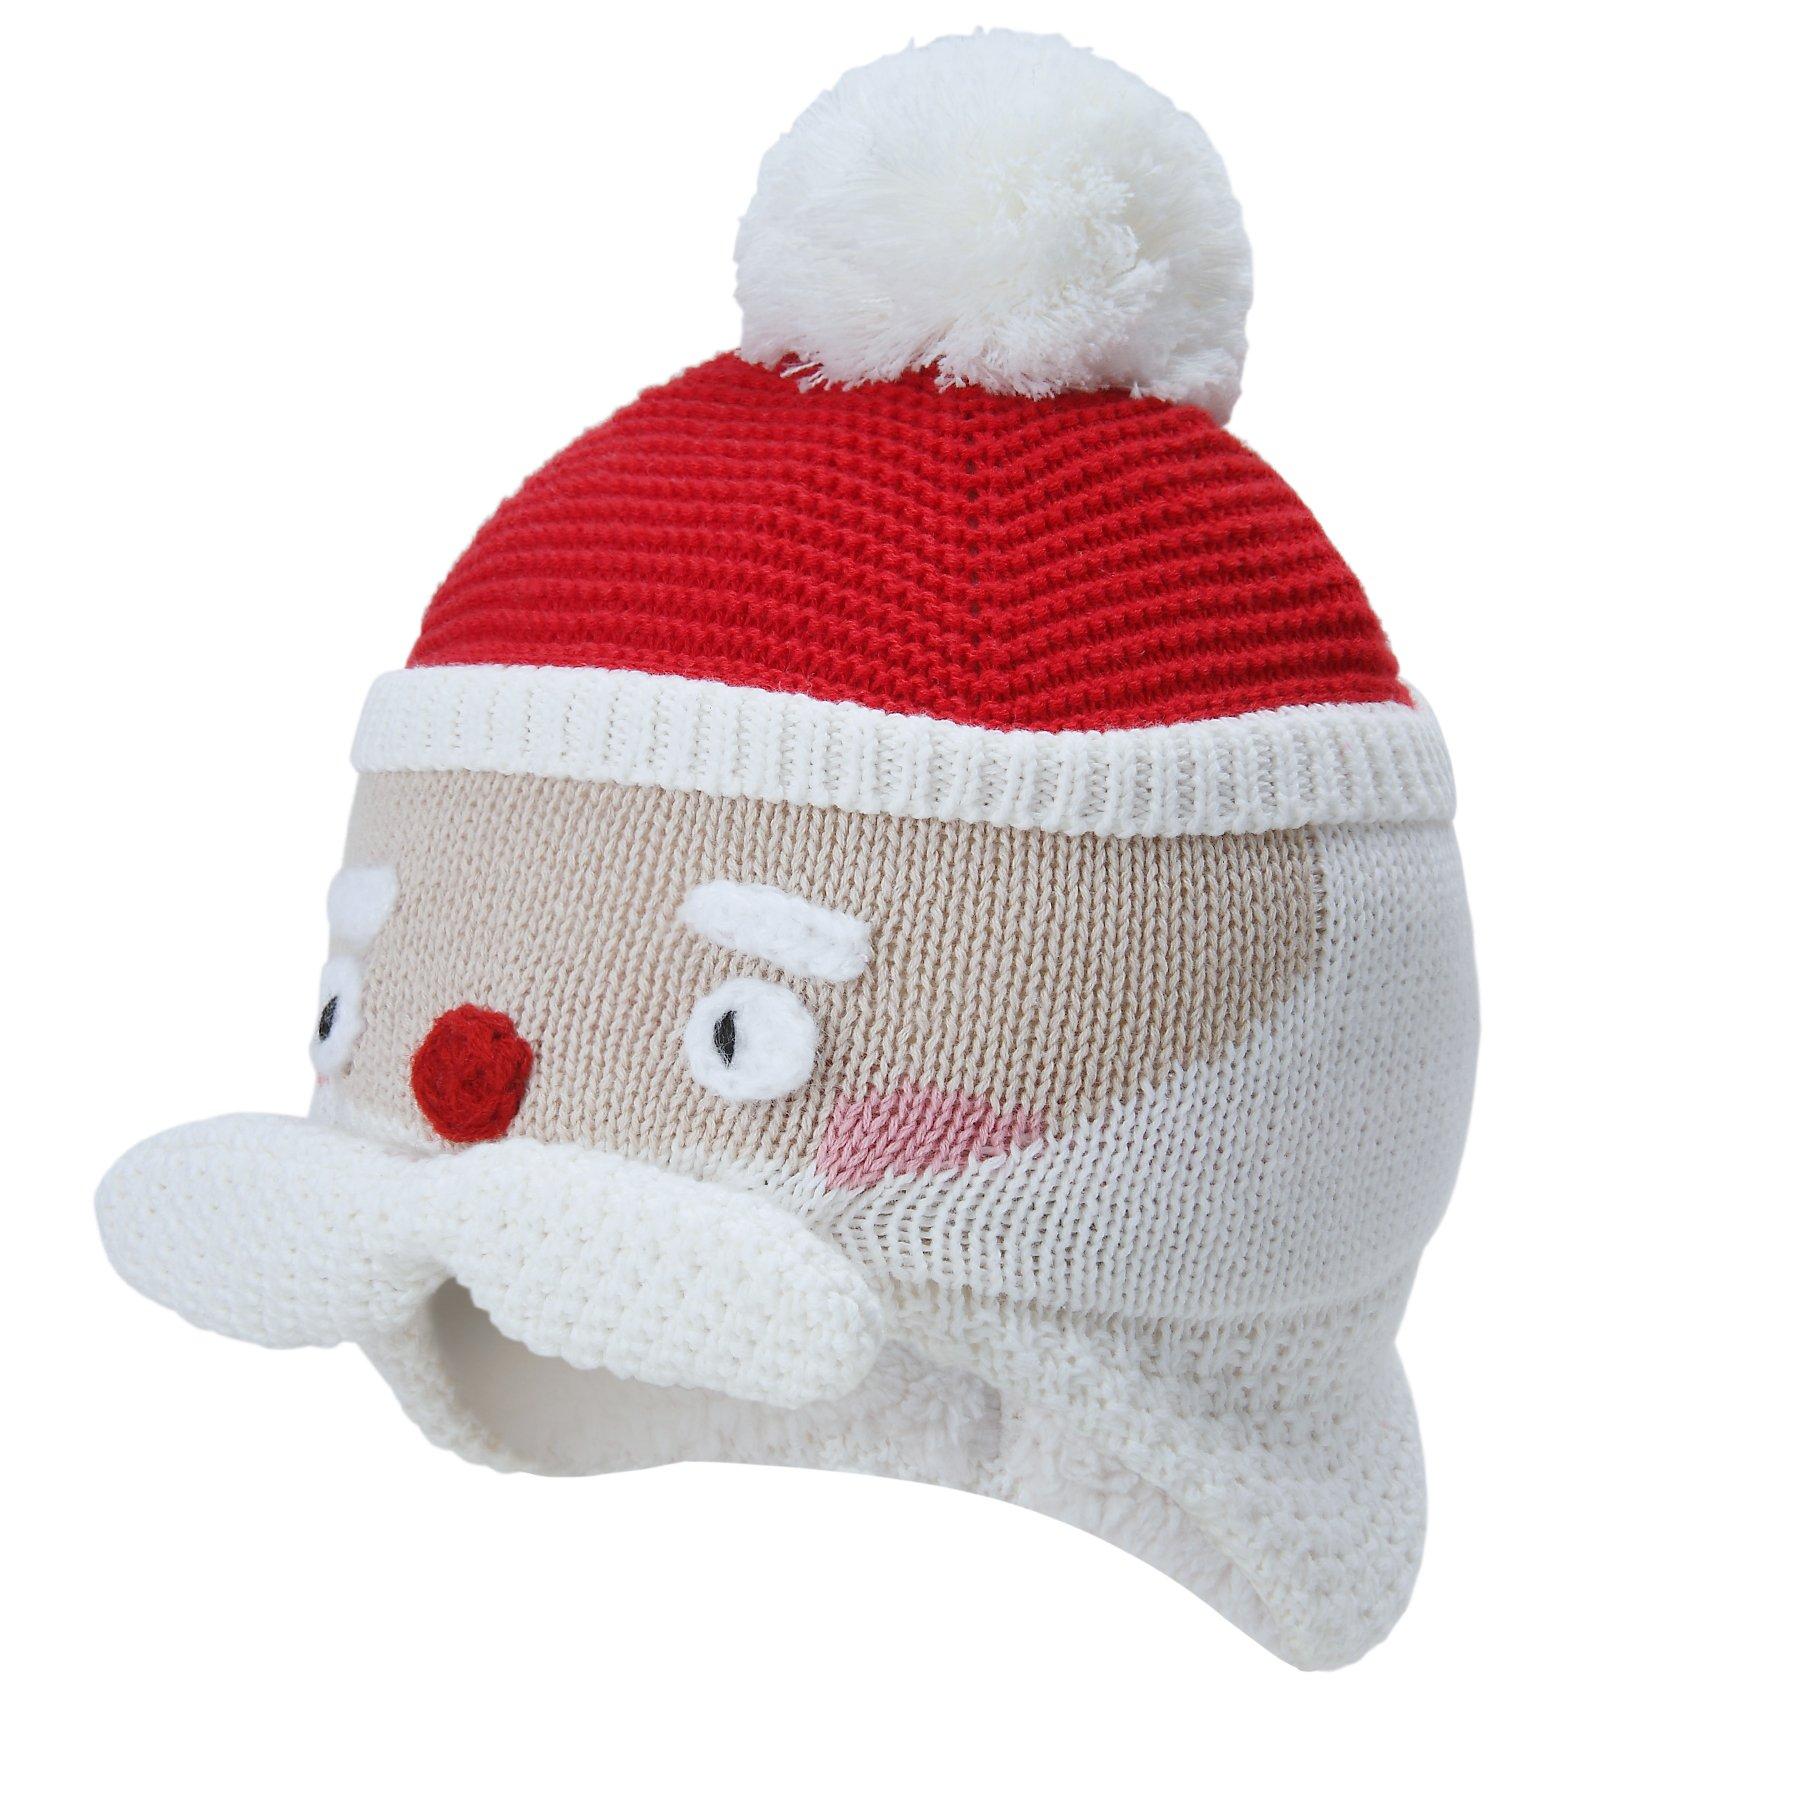 vivobiniya Kid Girl Winter Knitted Cap Baby GILR Earmuffs Cap Lovely 0-6years Old (2-6years Old(Head Girth 19.6in-21.2in))